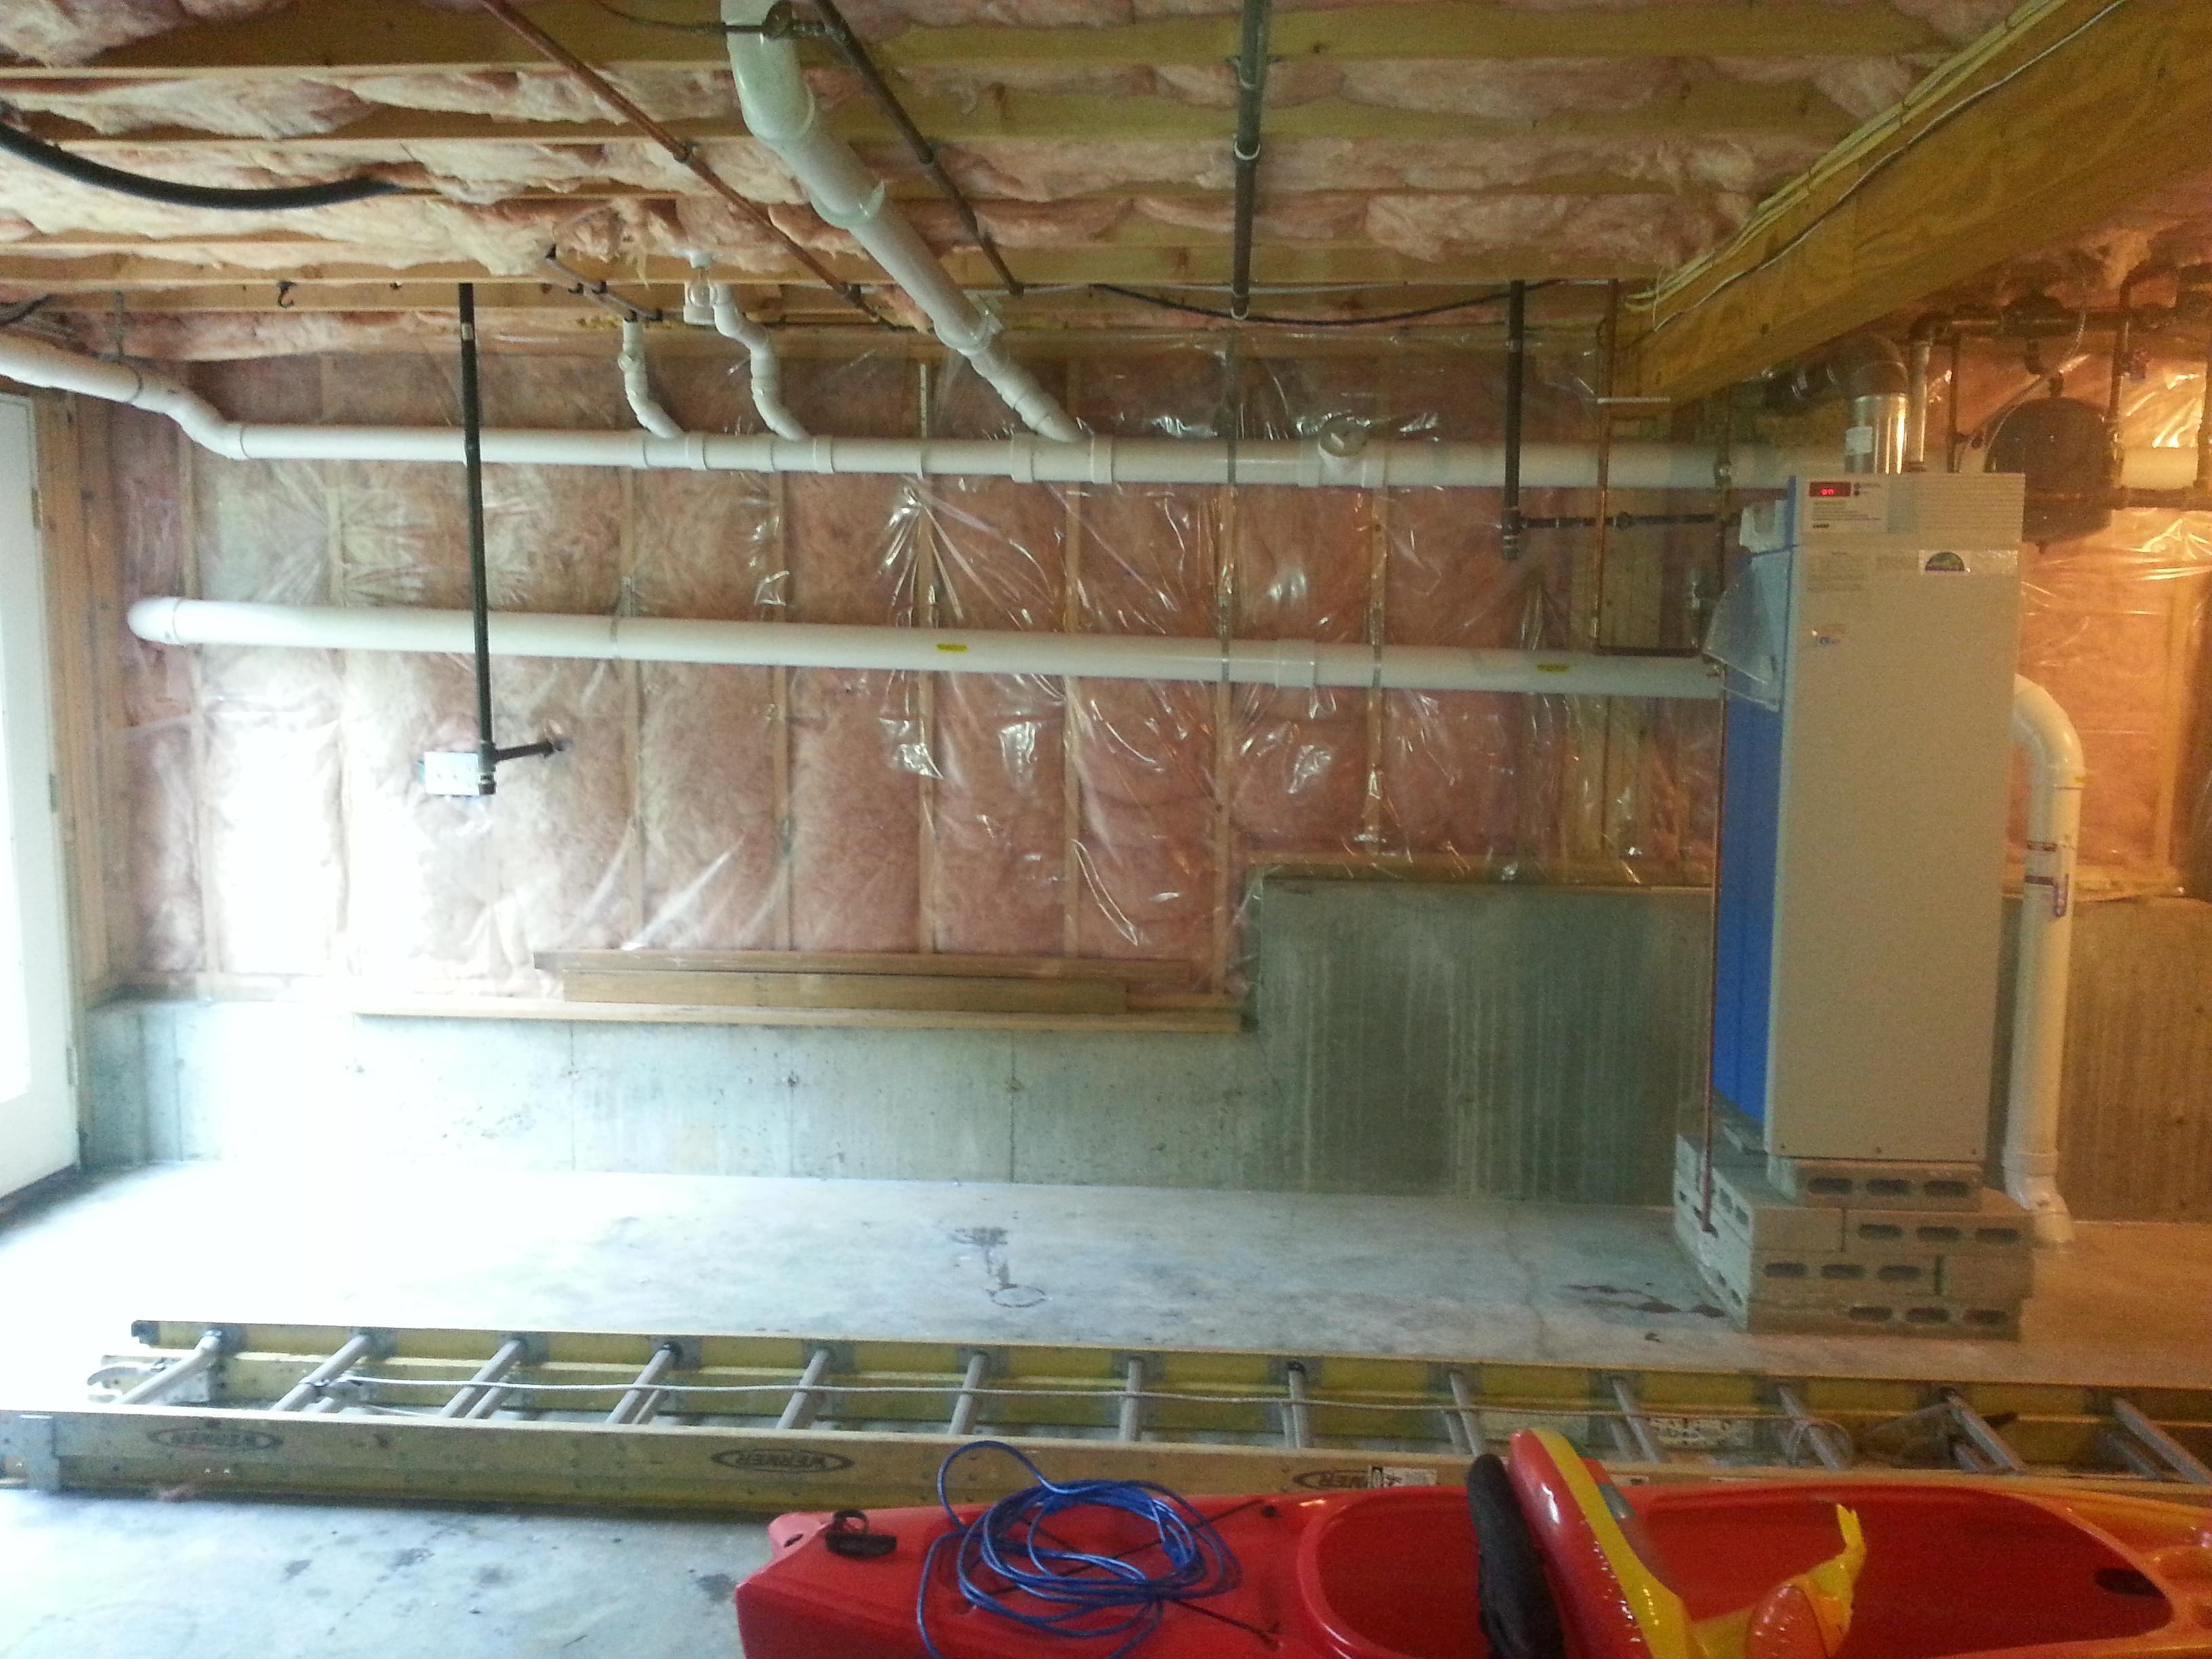 Interior radon piping